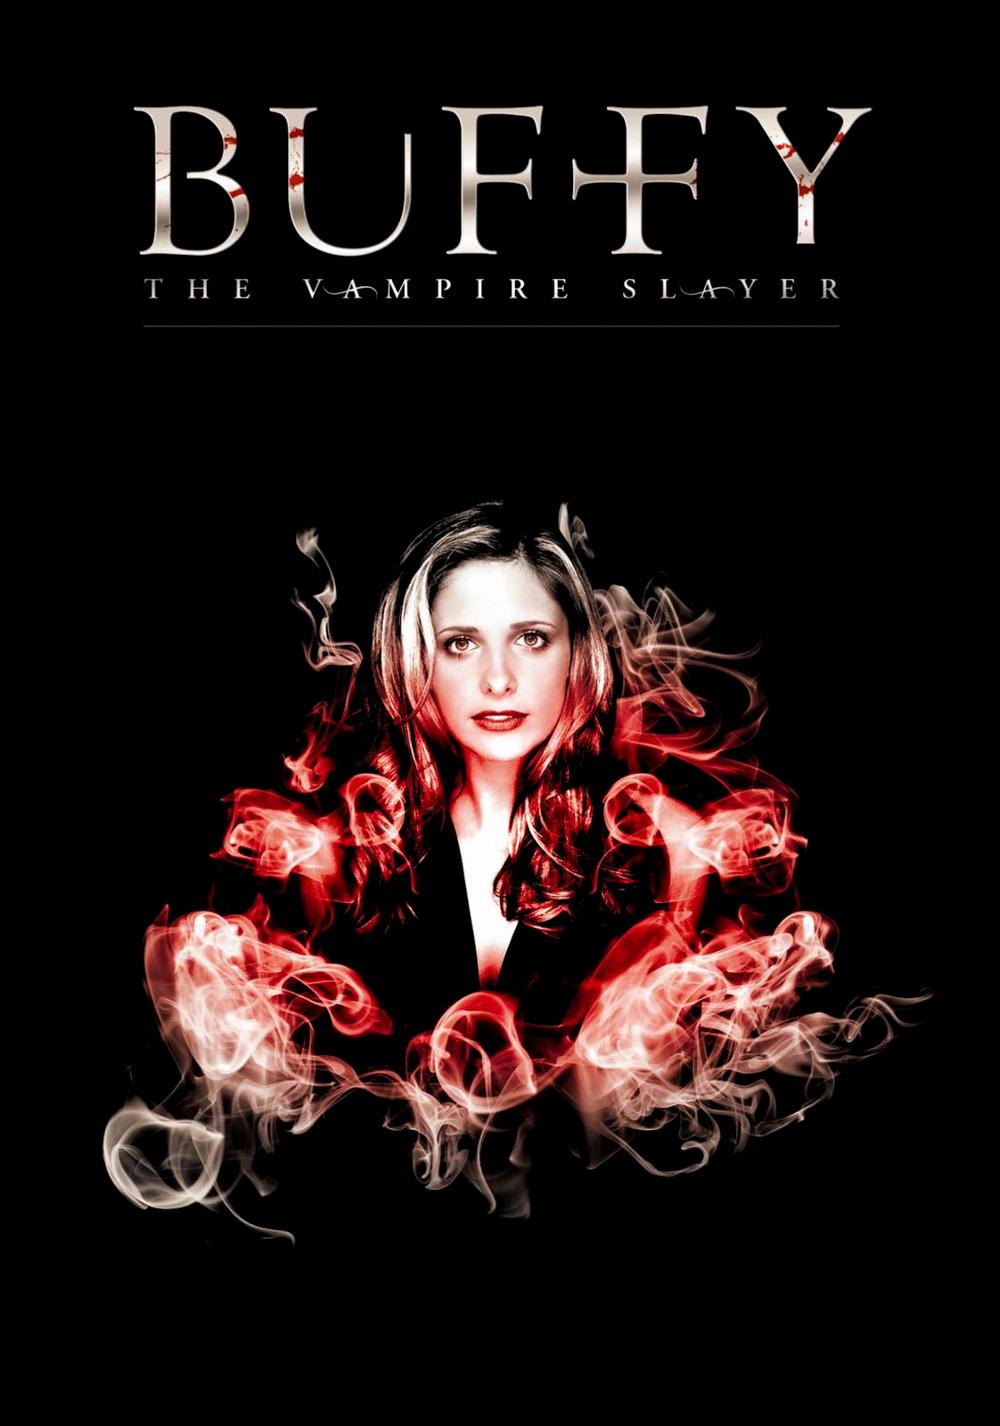 Buffy studies